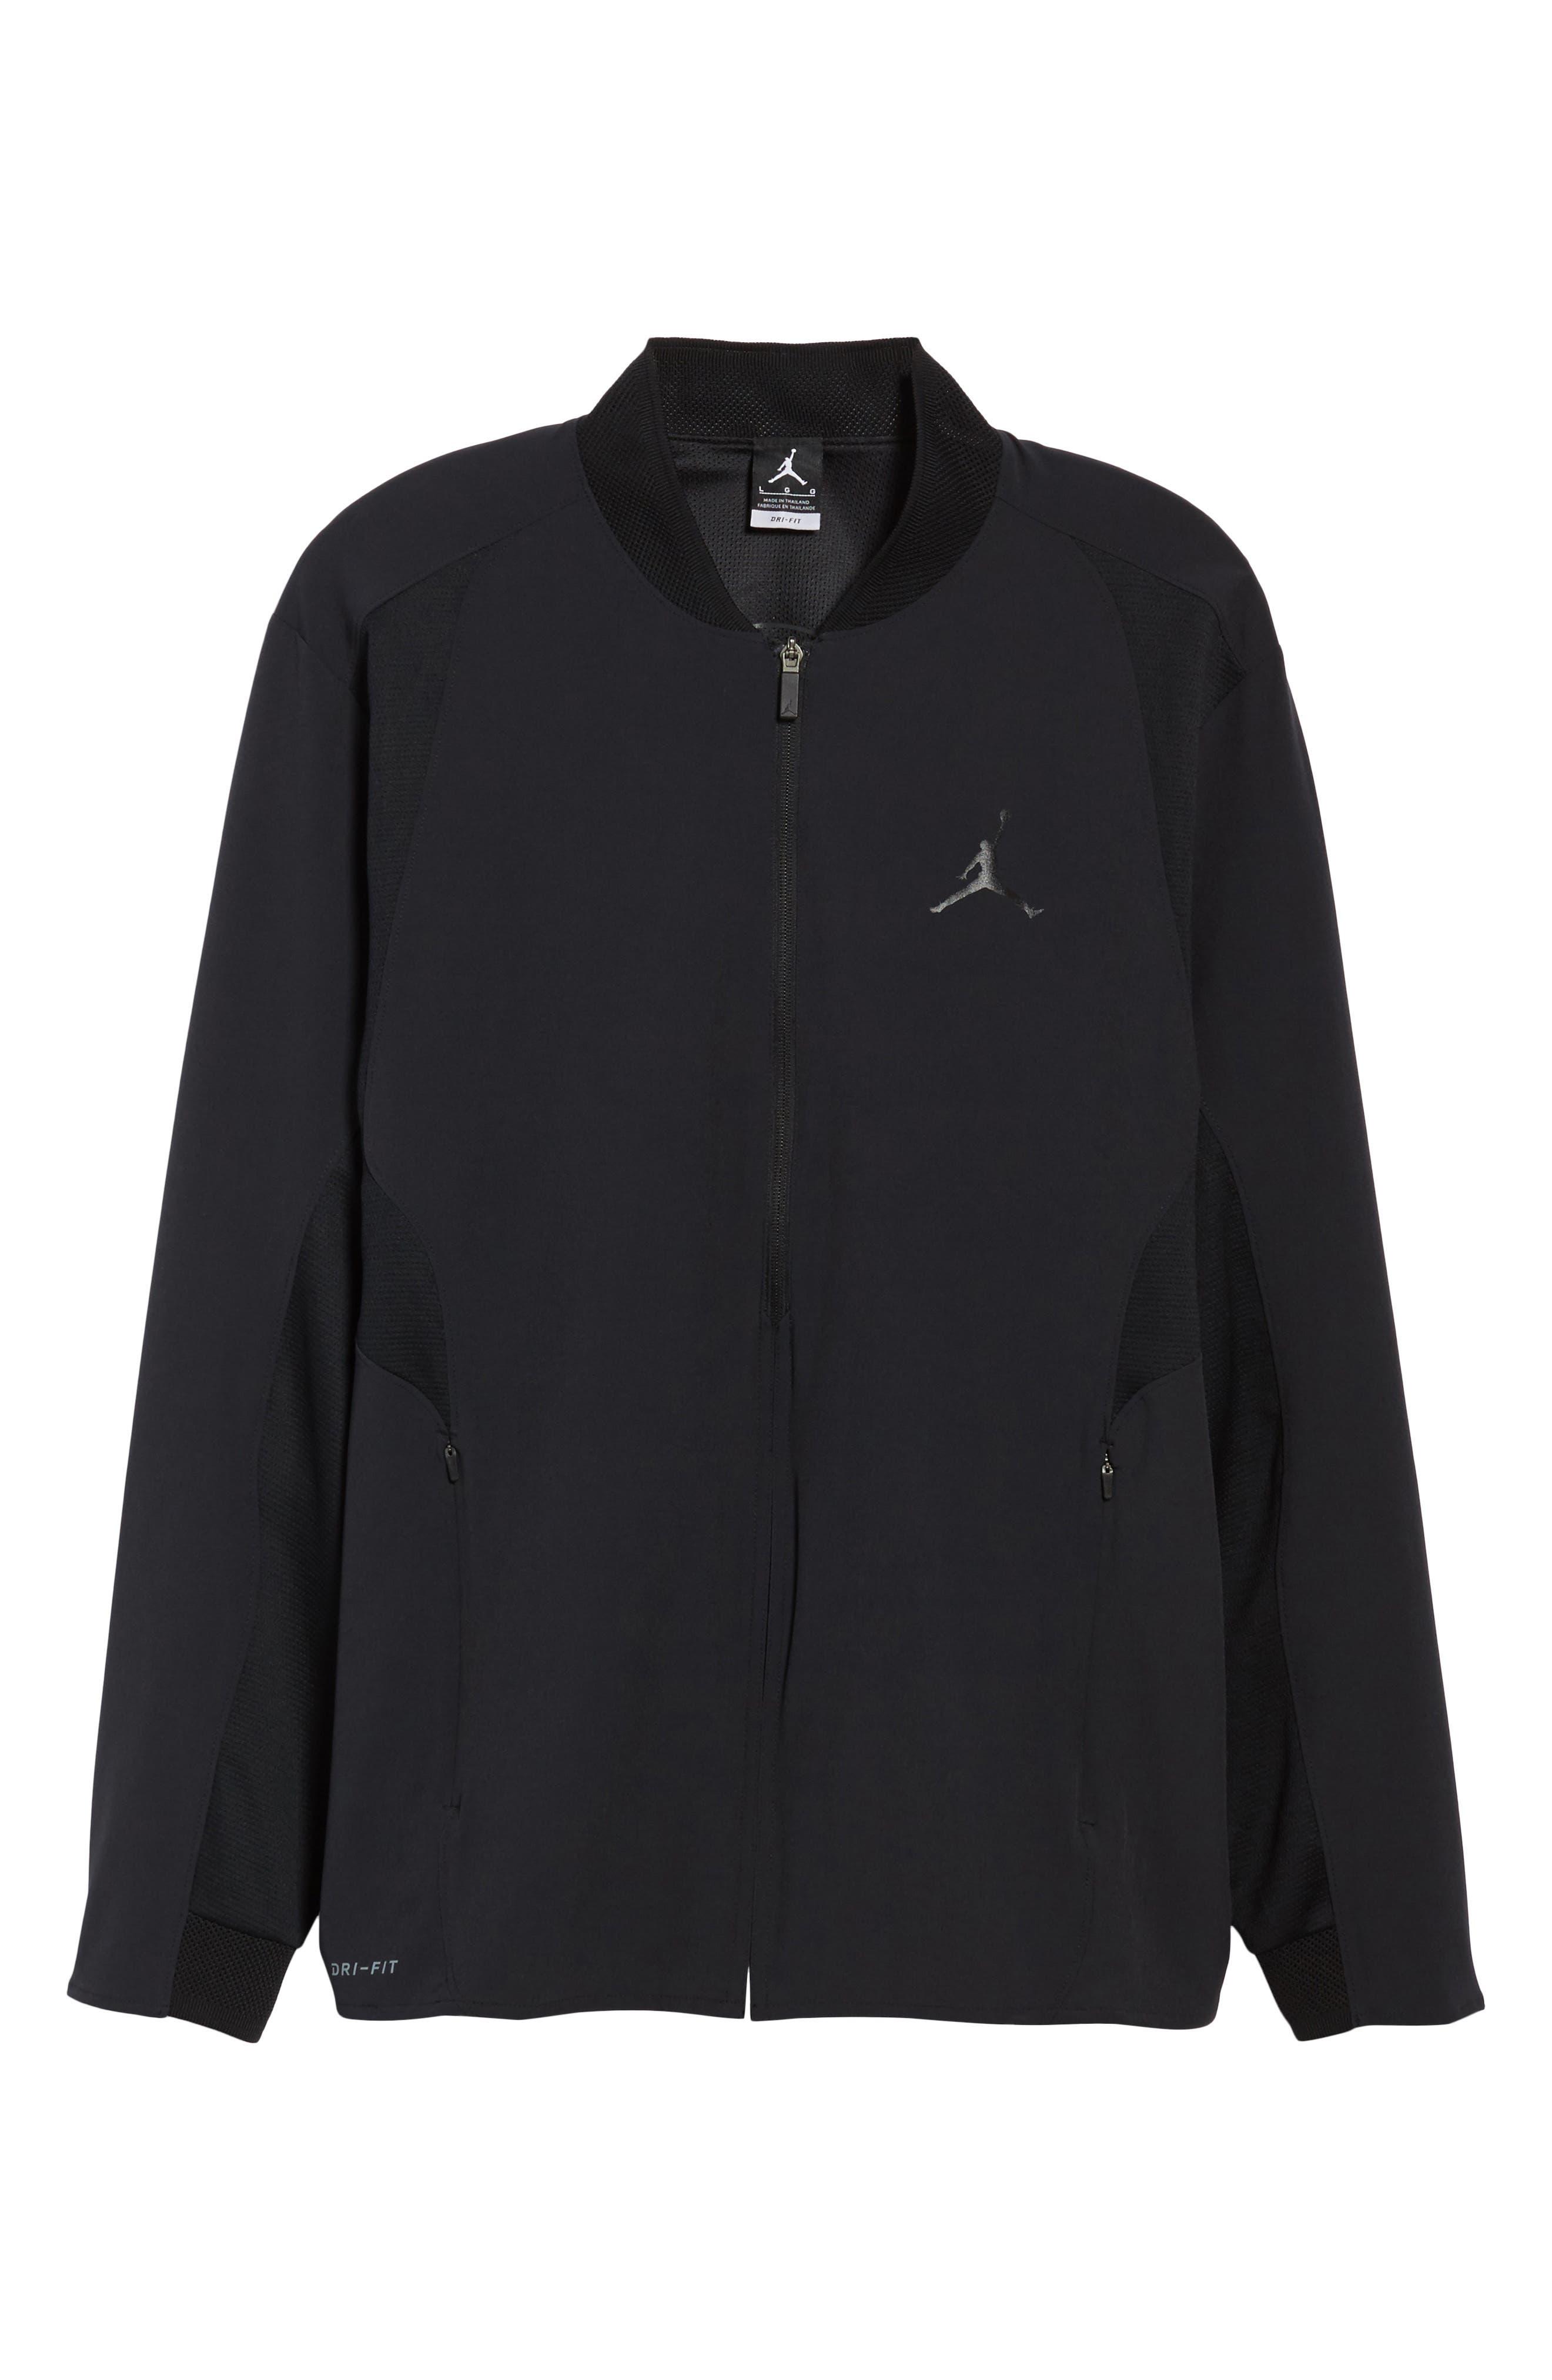 Ultimate Flight Zip Jacket,                             Alternate thumbnail 5, color,                             Black/ Black